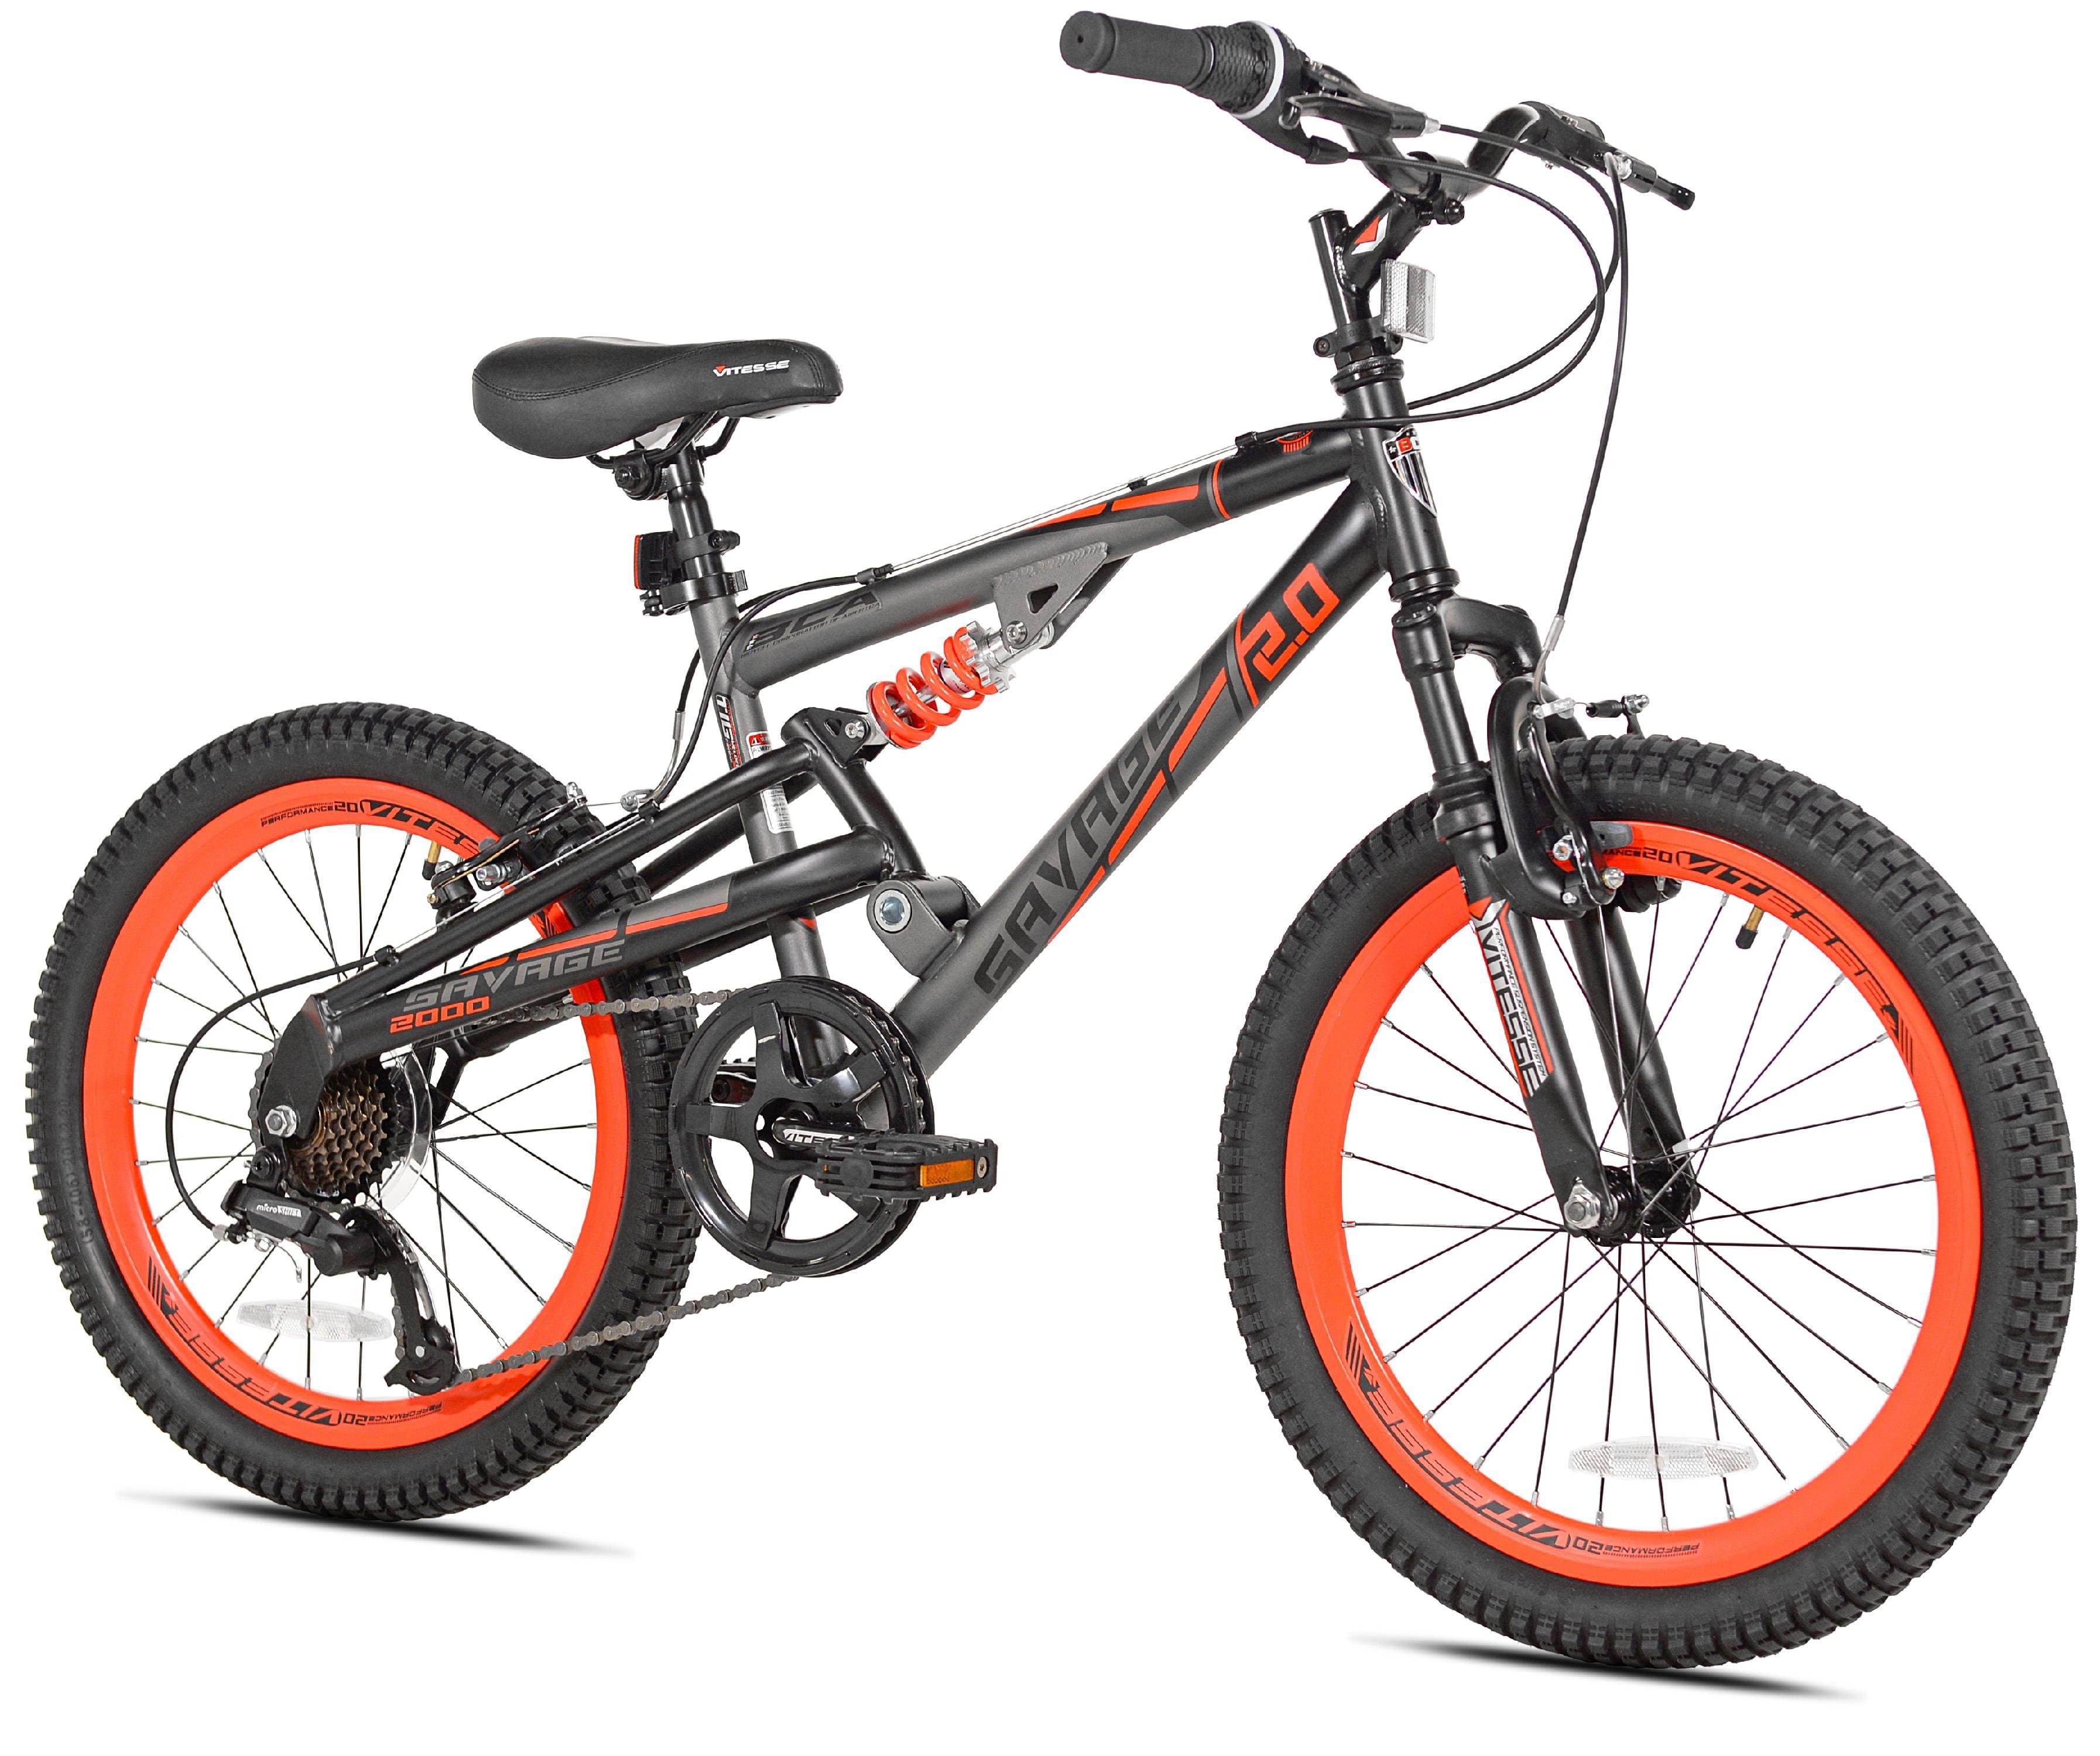 "FULL SUSPENSION Bike Bicycle FRAME for 20/"" WHEEL Size 13/""  BLACK /& ORANGE"